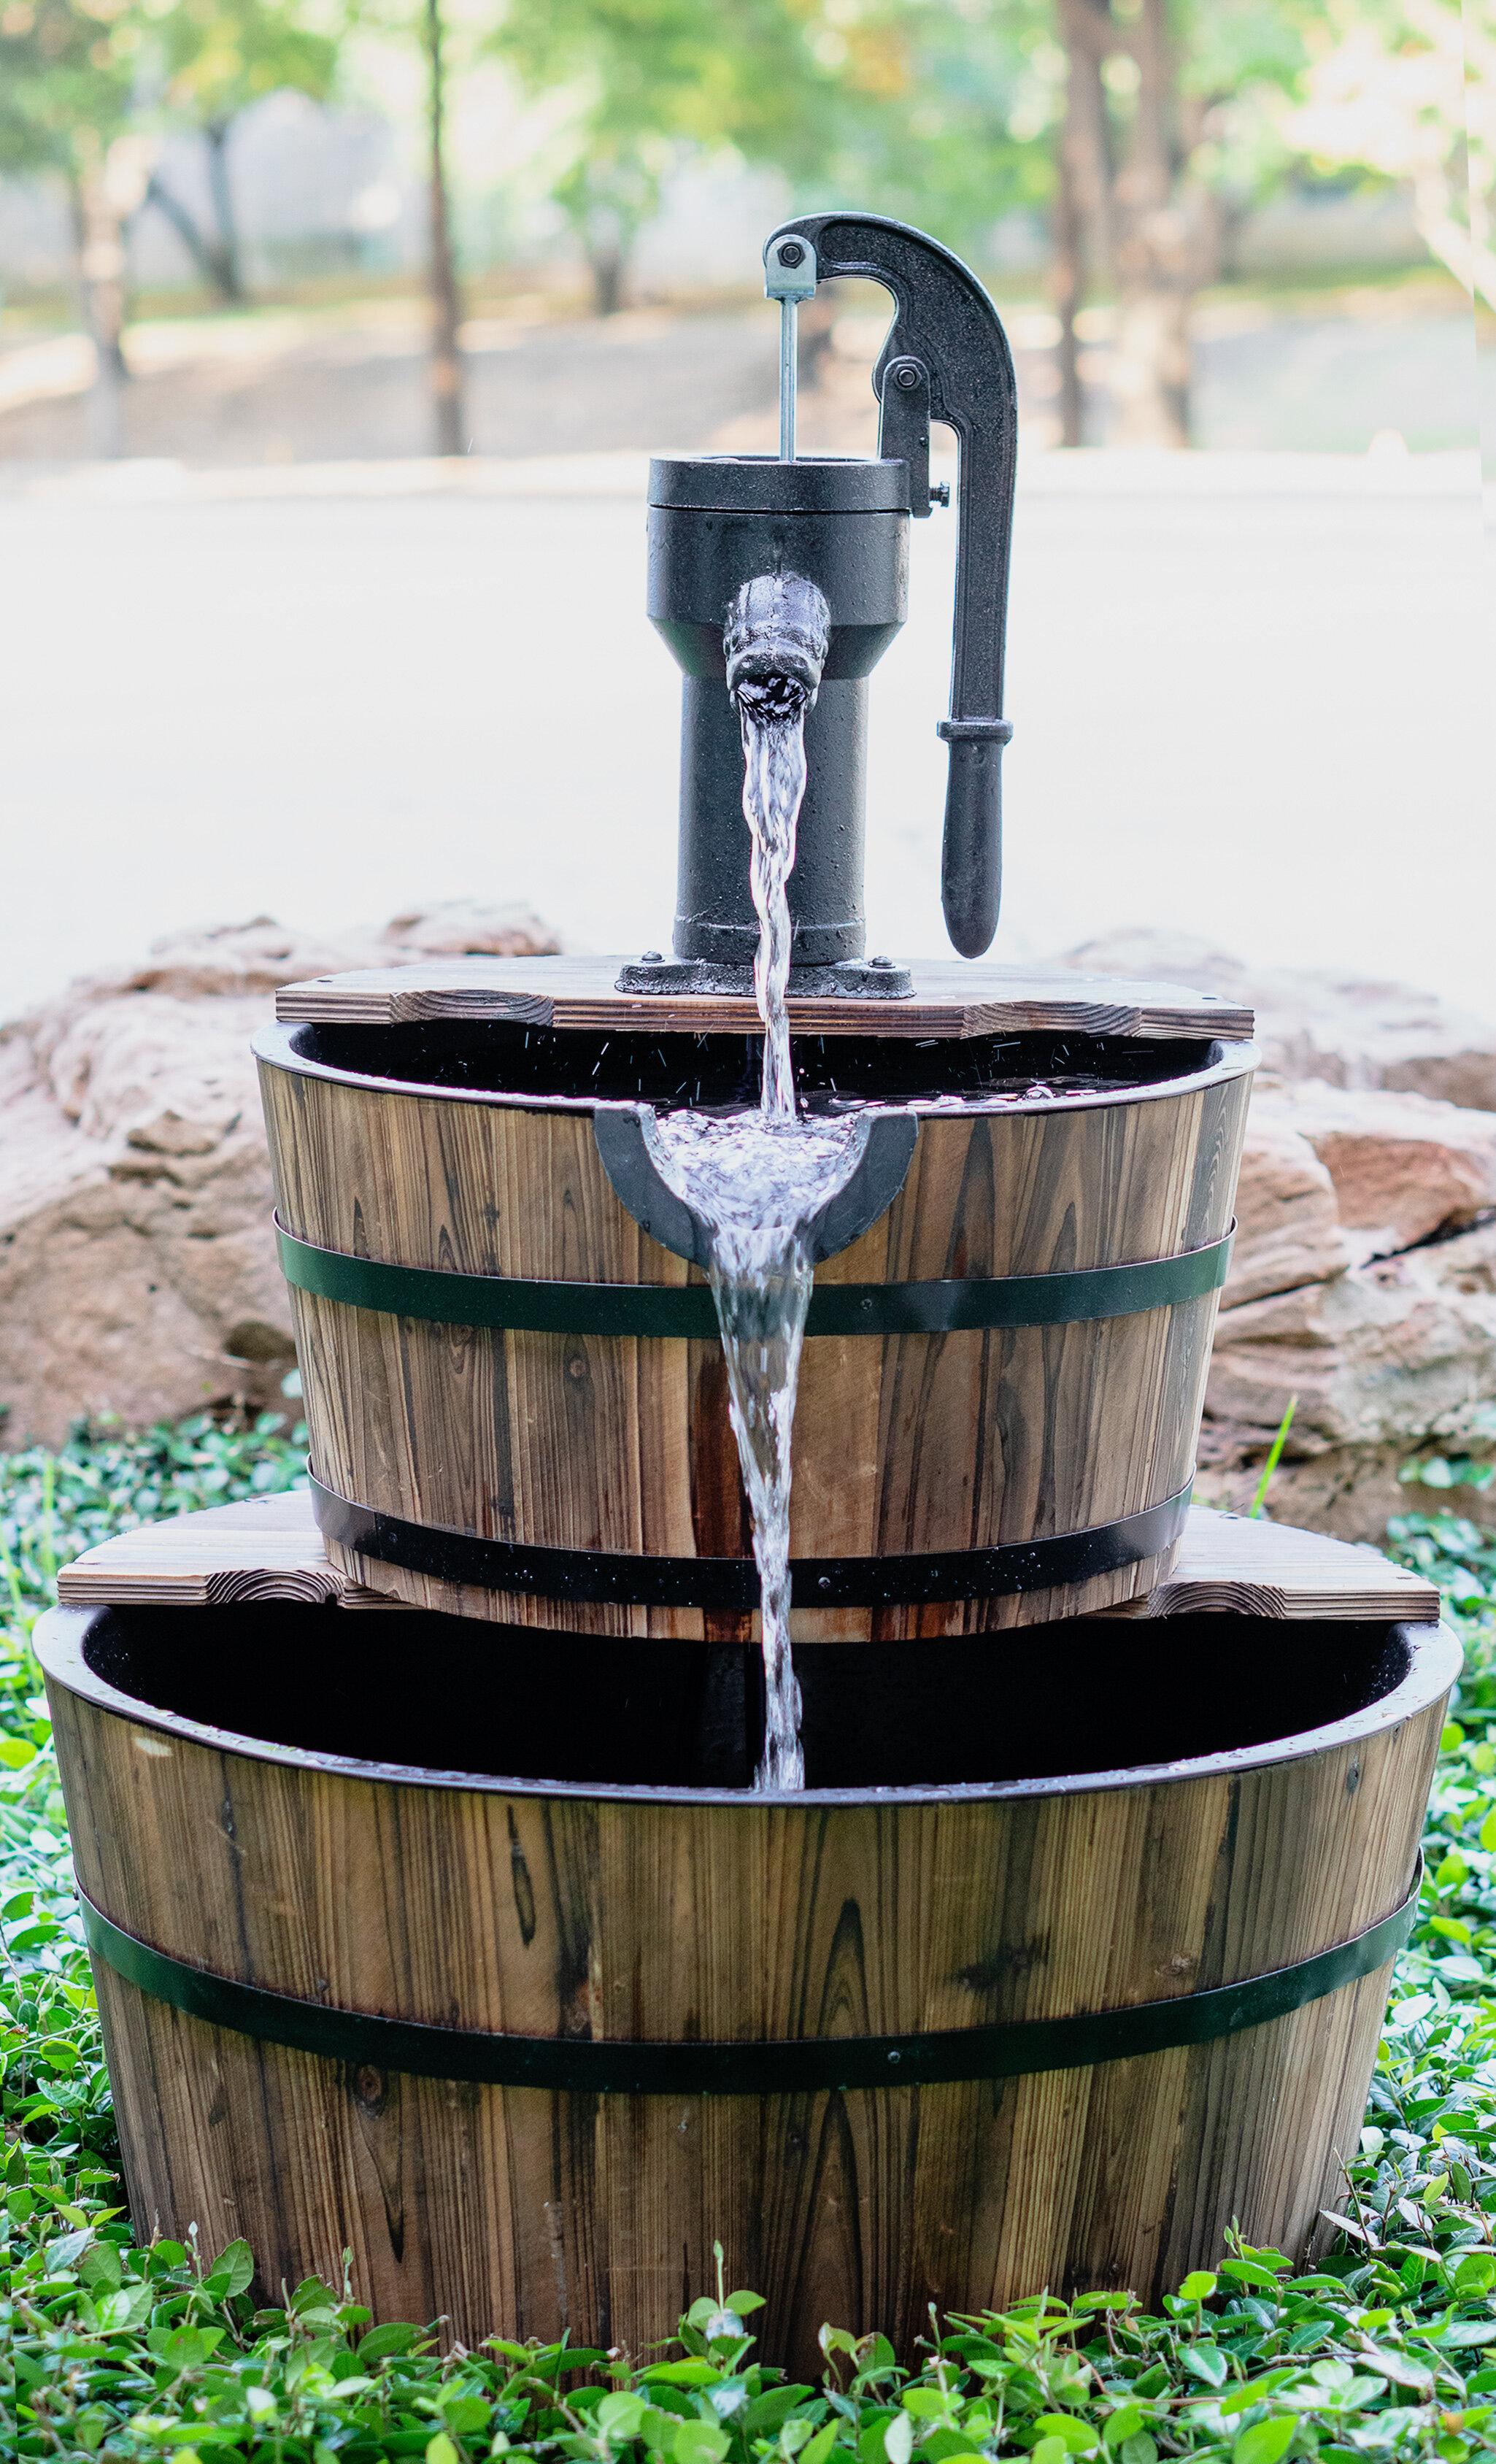 50cm Large Black Barrel Planter Plant Pot Plastic Indoor Outdoor Barrel Planter